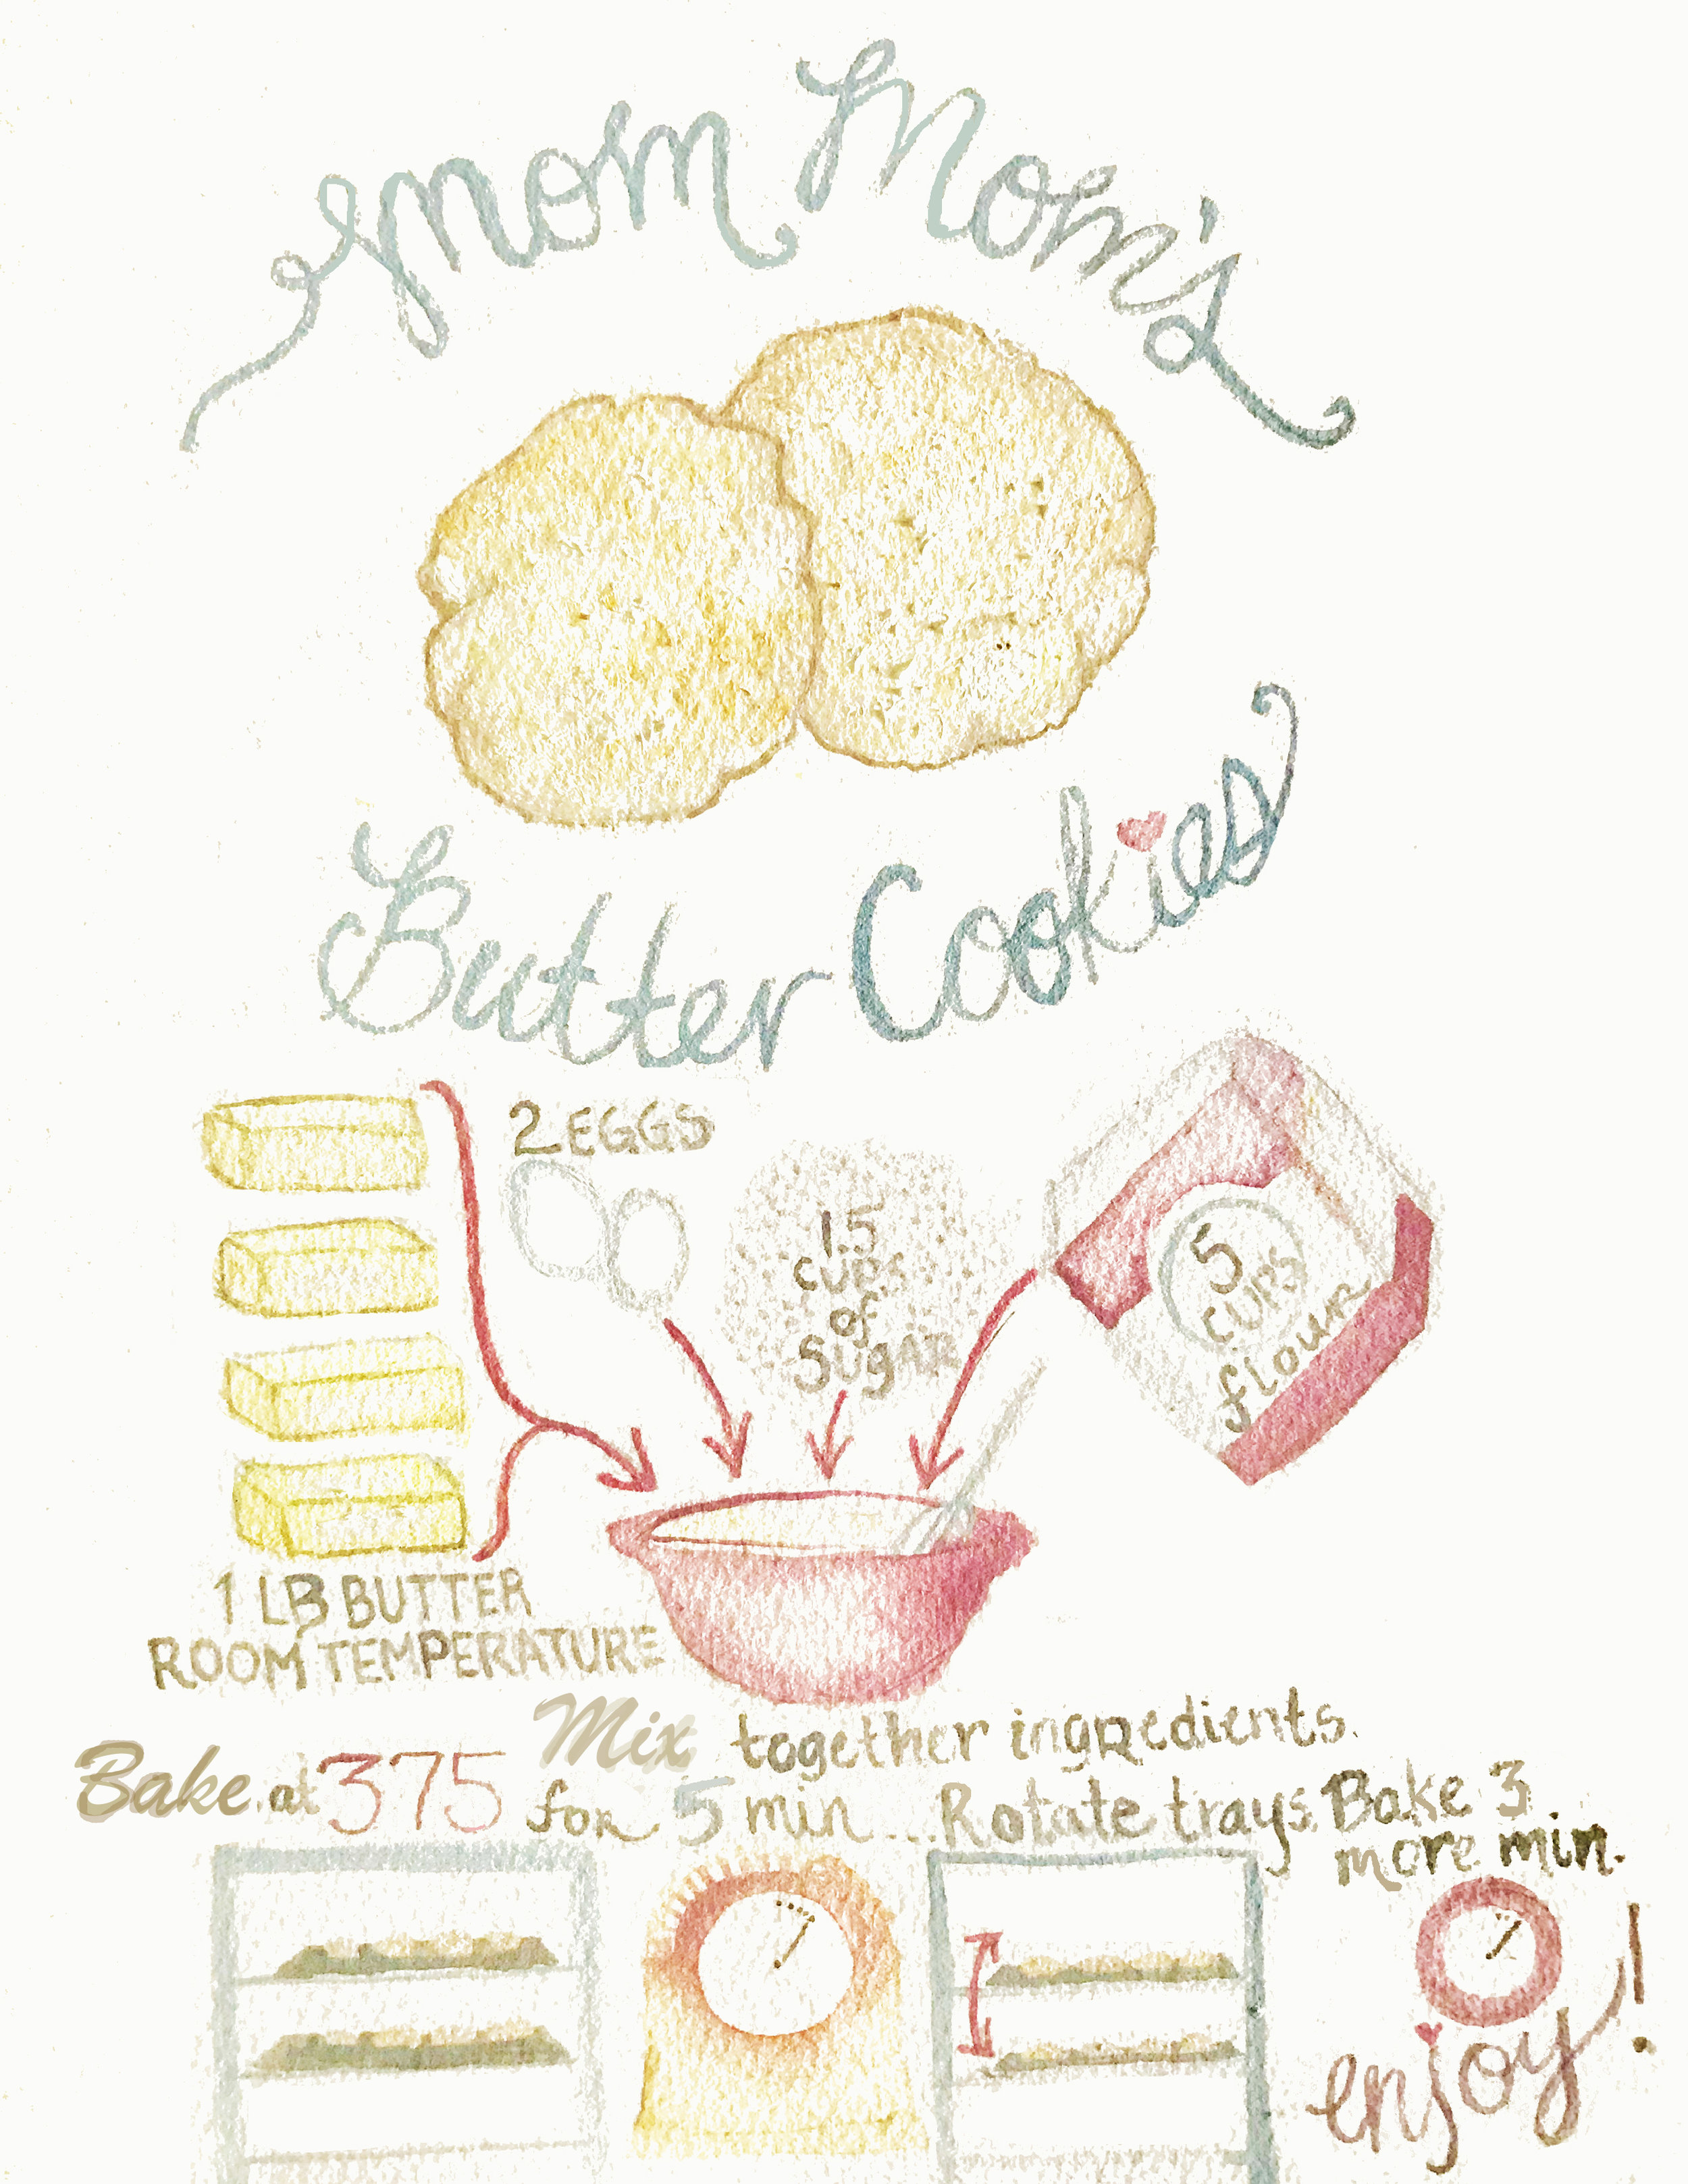 butter cookies recipe .jpg